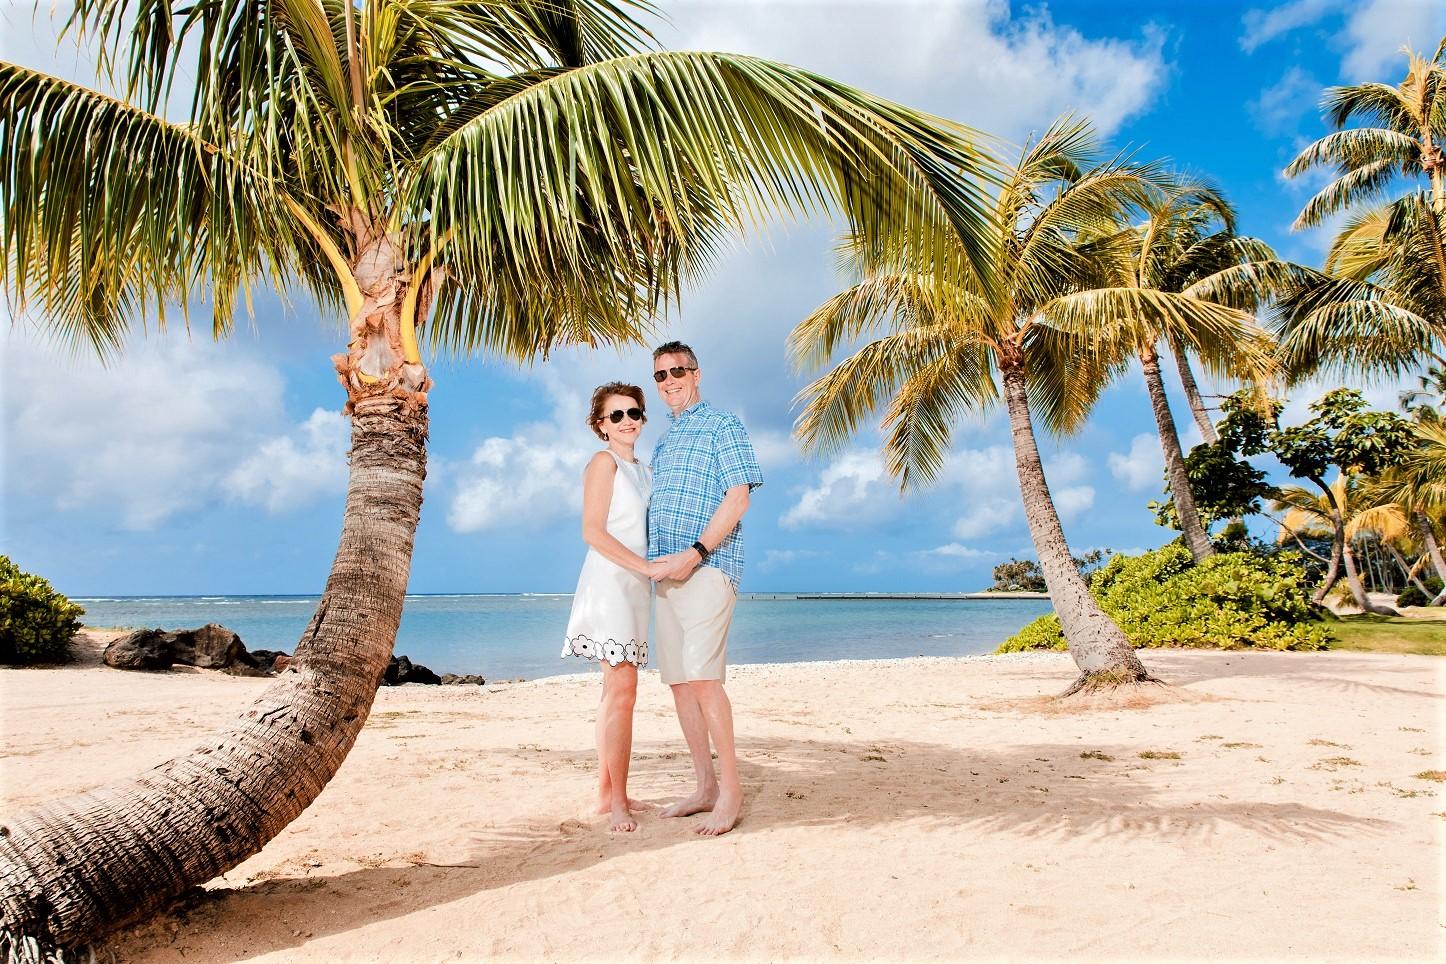 couples beach palm tree hawaii anniversary portrait